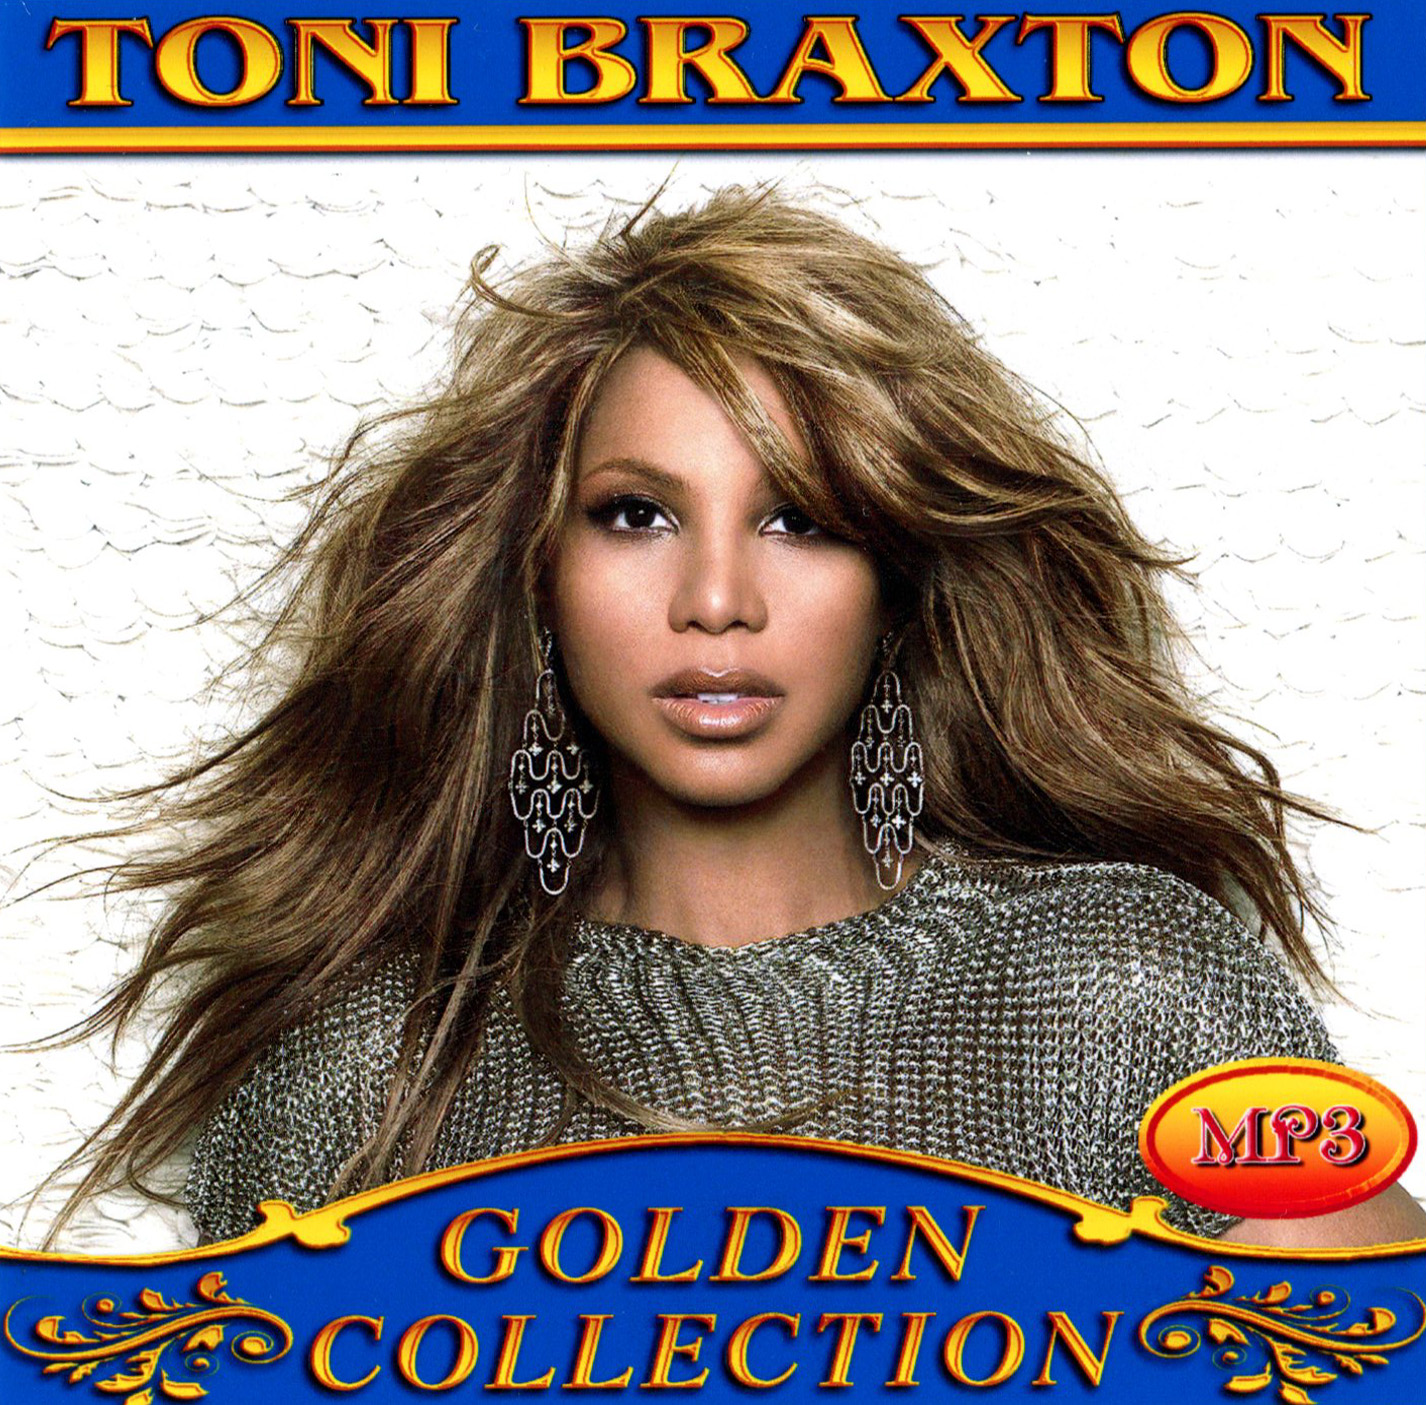 Toni Braxton [mp3]